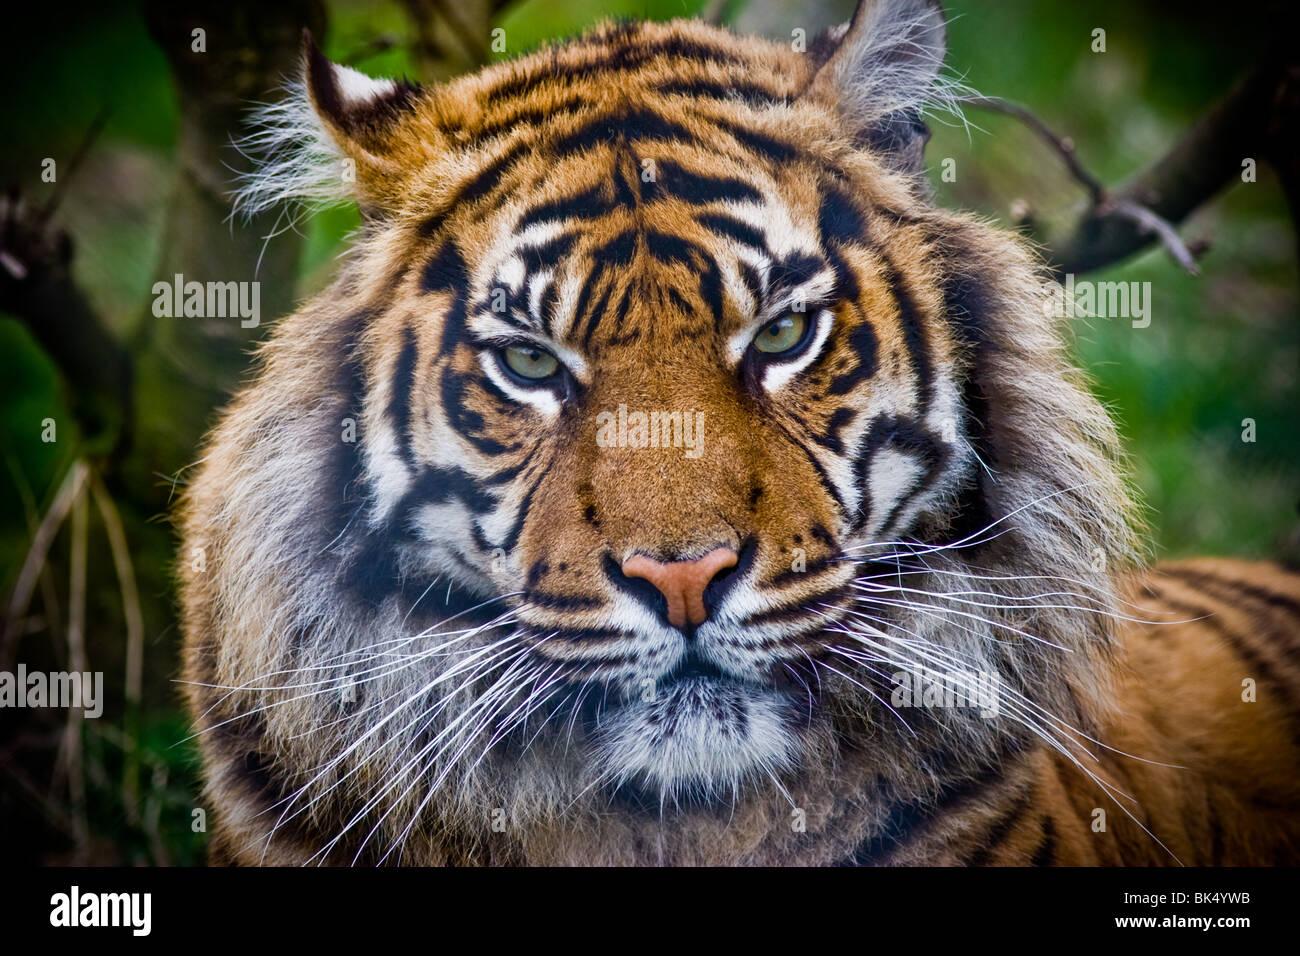 Tigre de Sumatra - Panthere tigris sumatrae Imagen De Stock